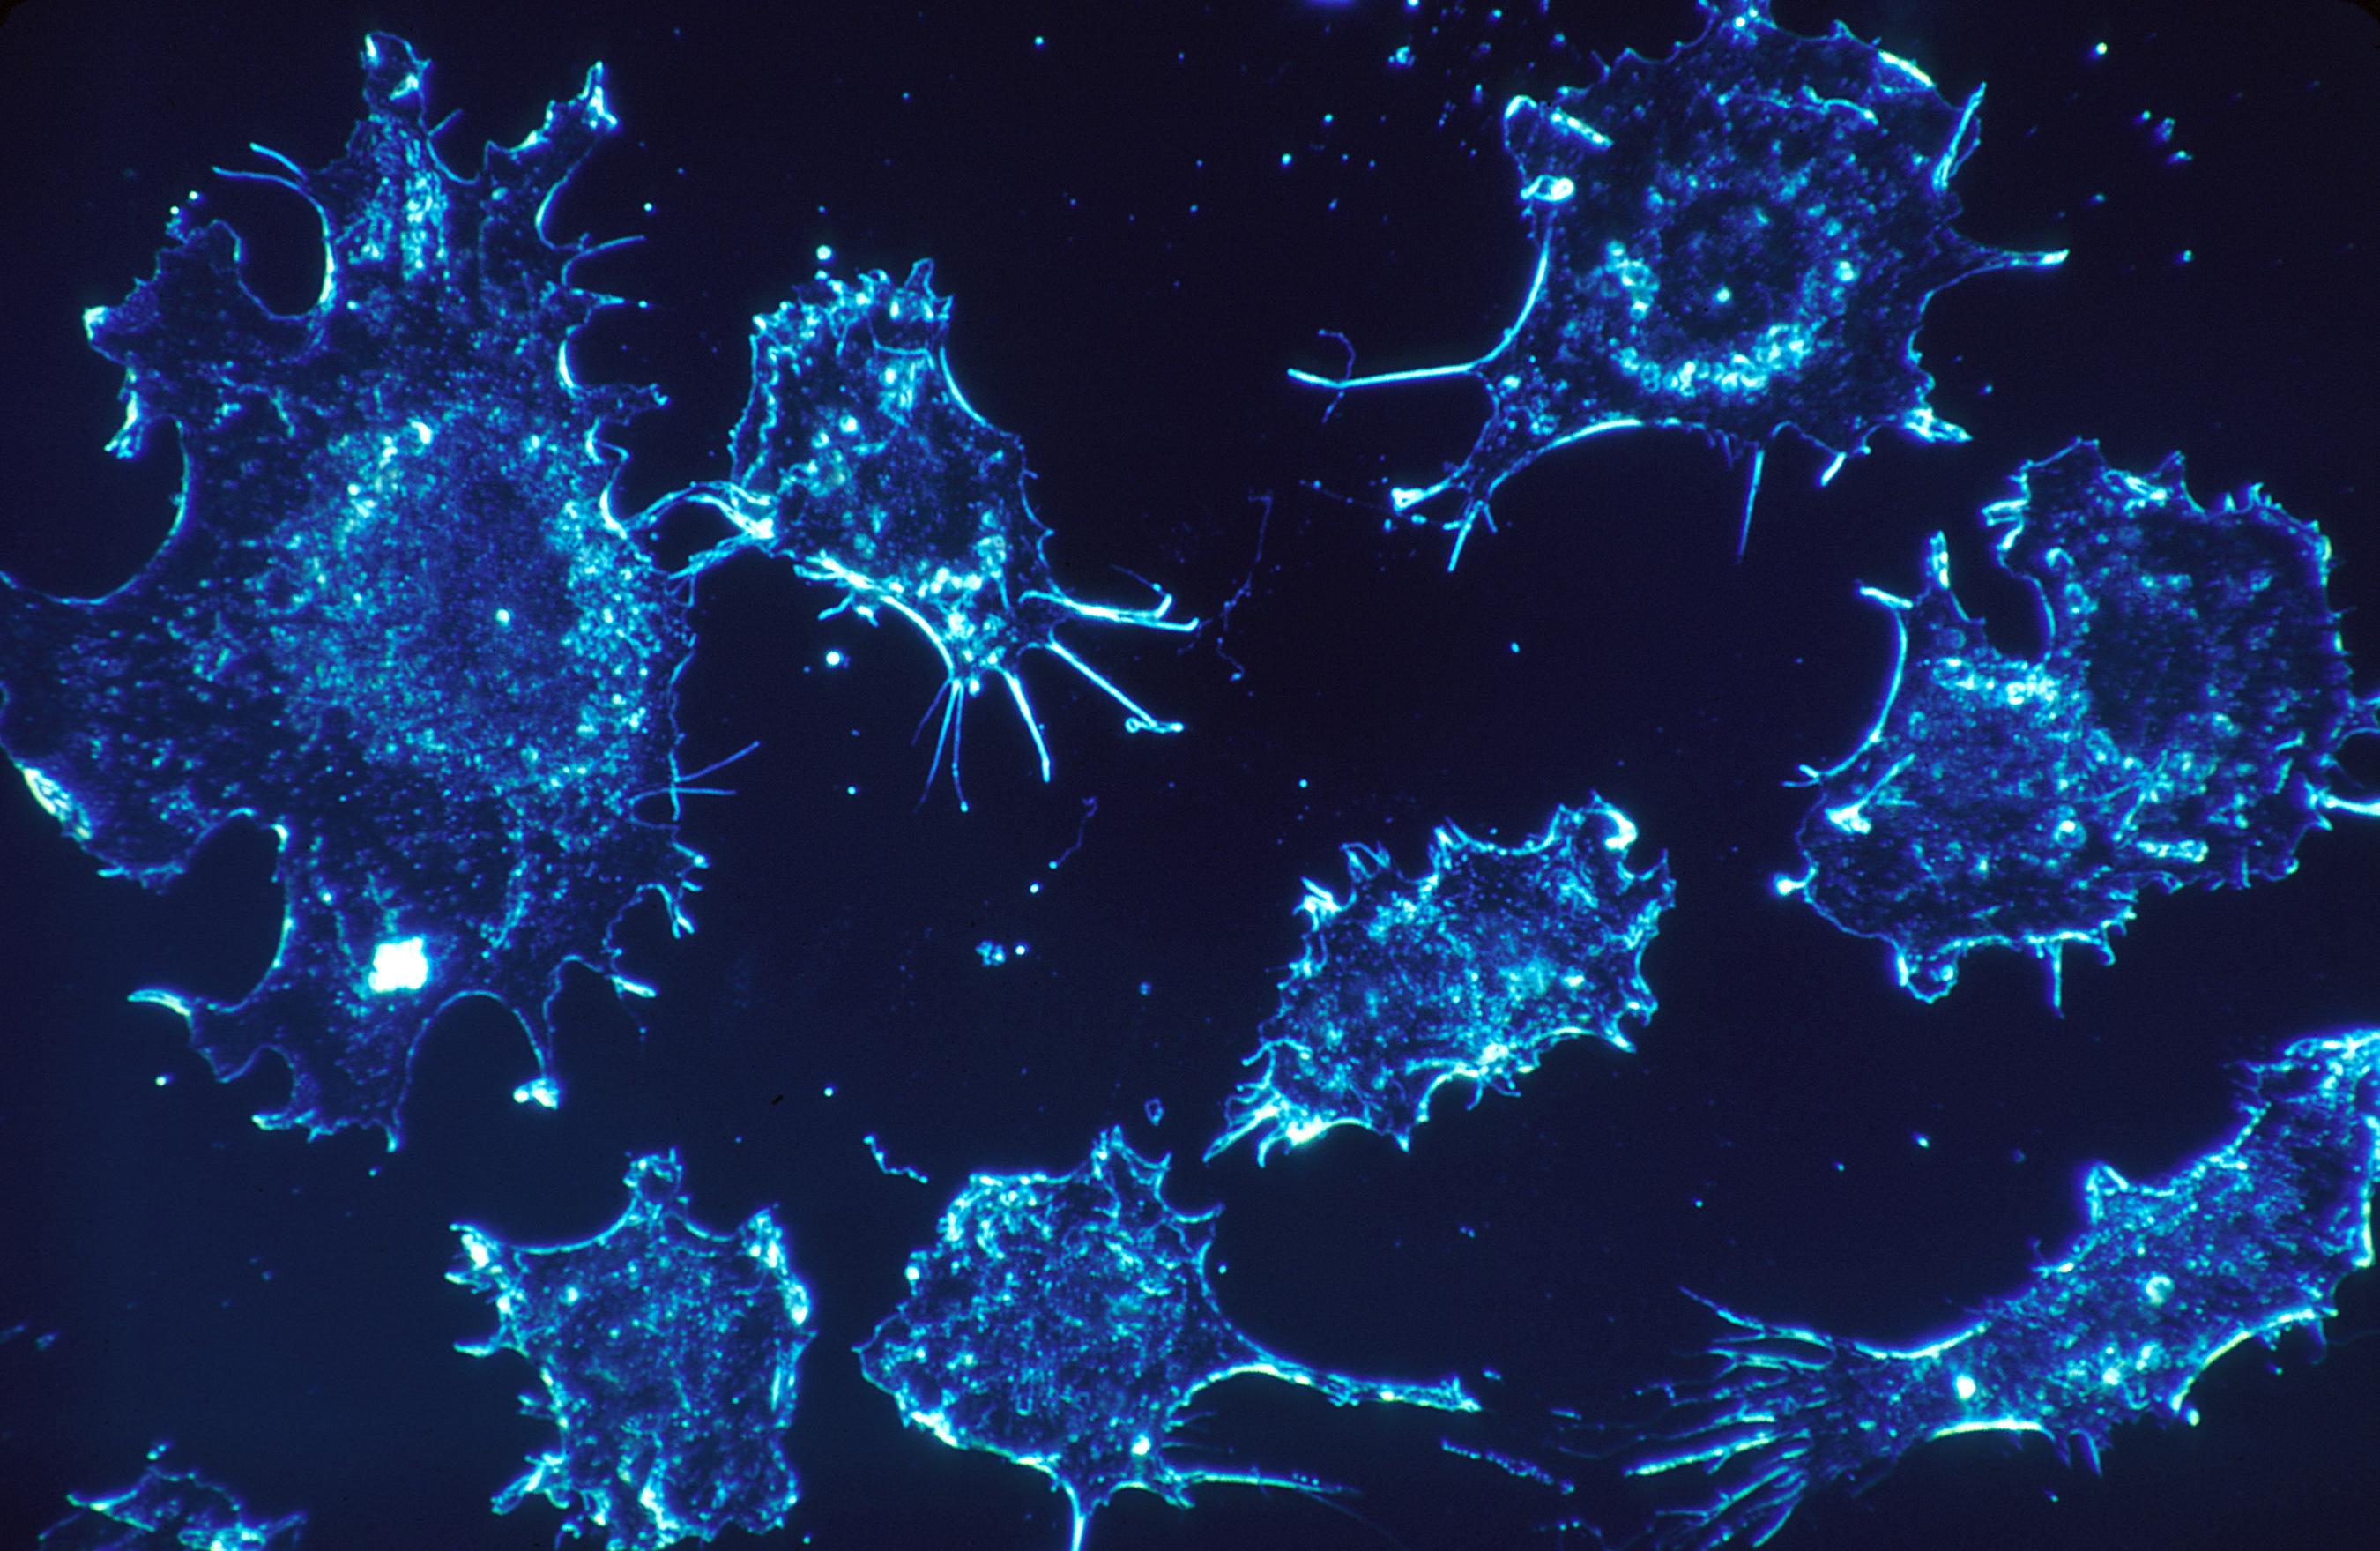 Cancer_cells_(1)